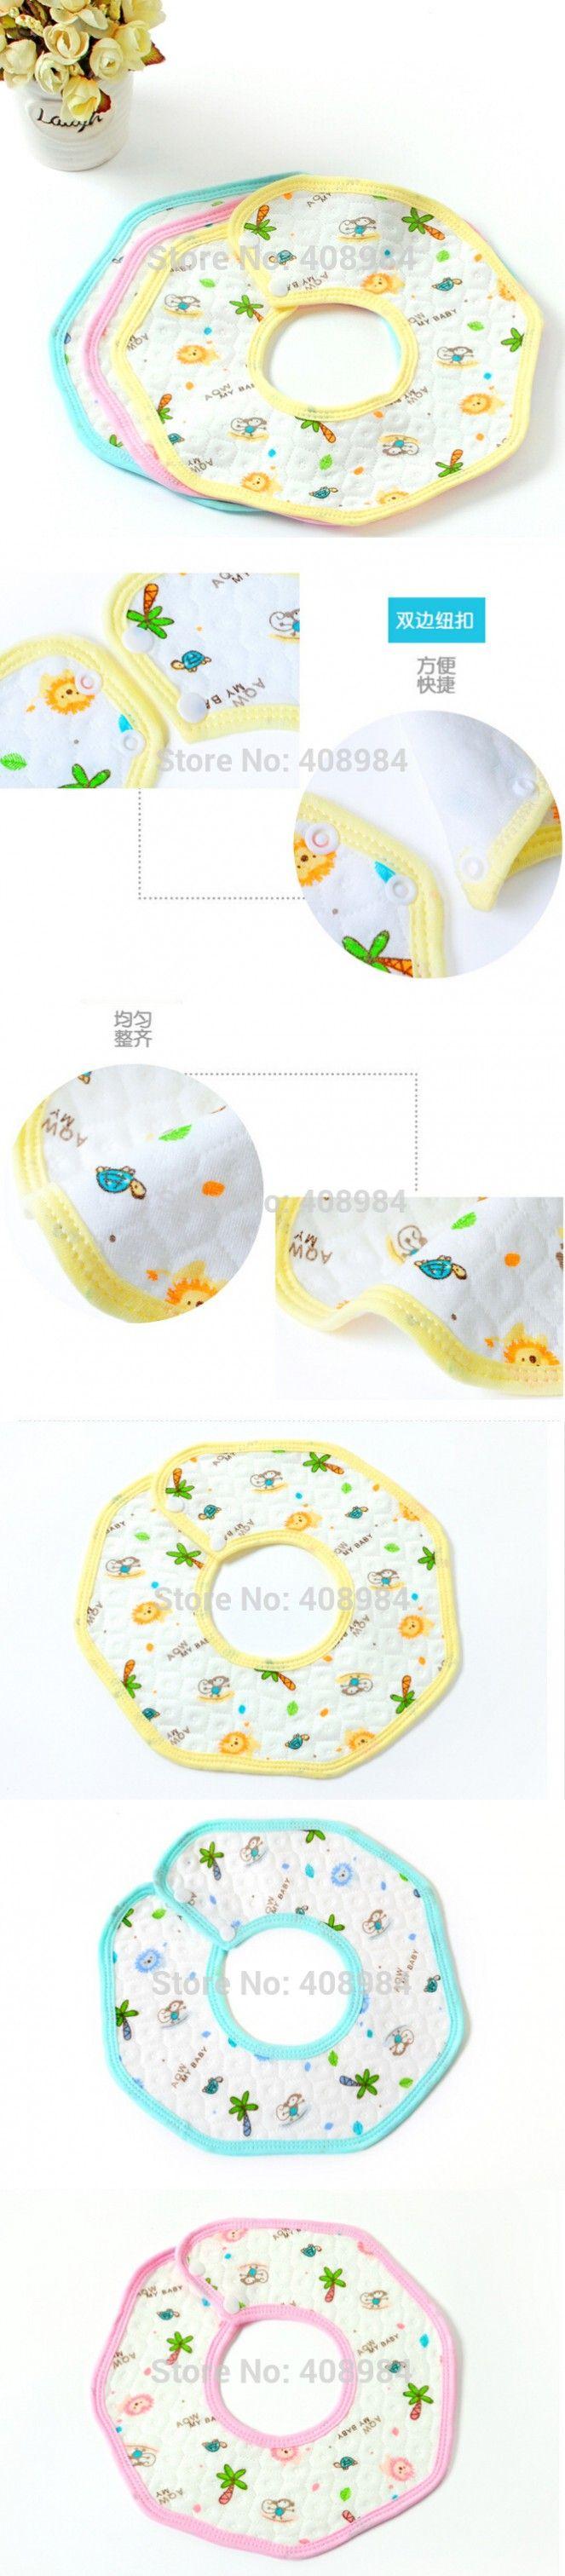 Octagonal Feeding Burp Cloths cotton Baby Waterproof bib boys girls bibs Infant saliva towels Baby Accessories $62